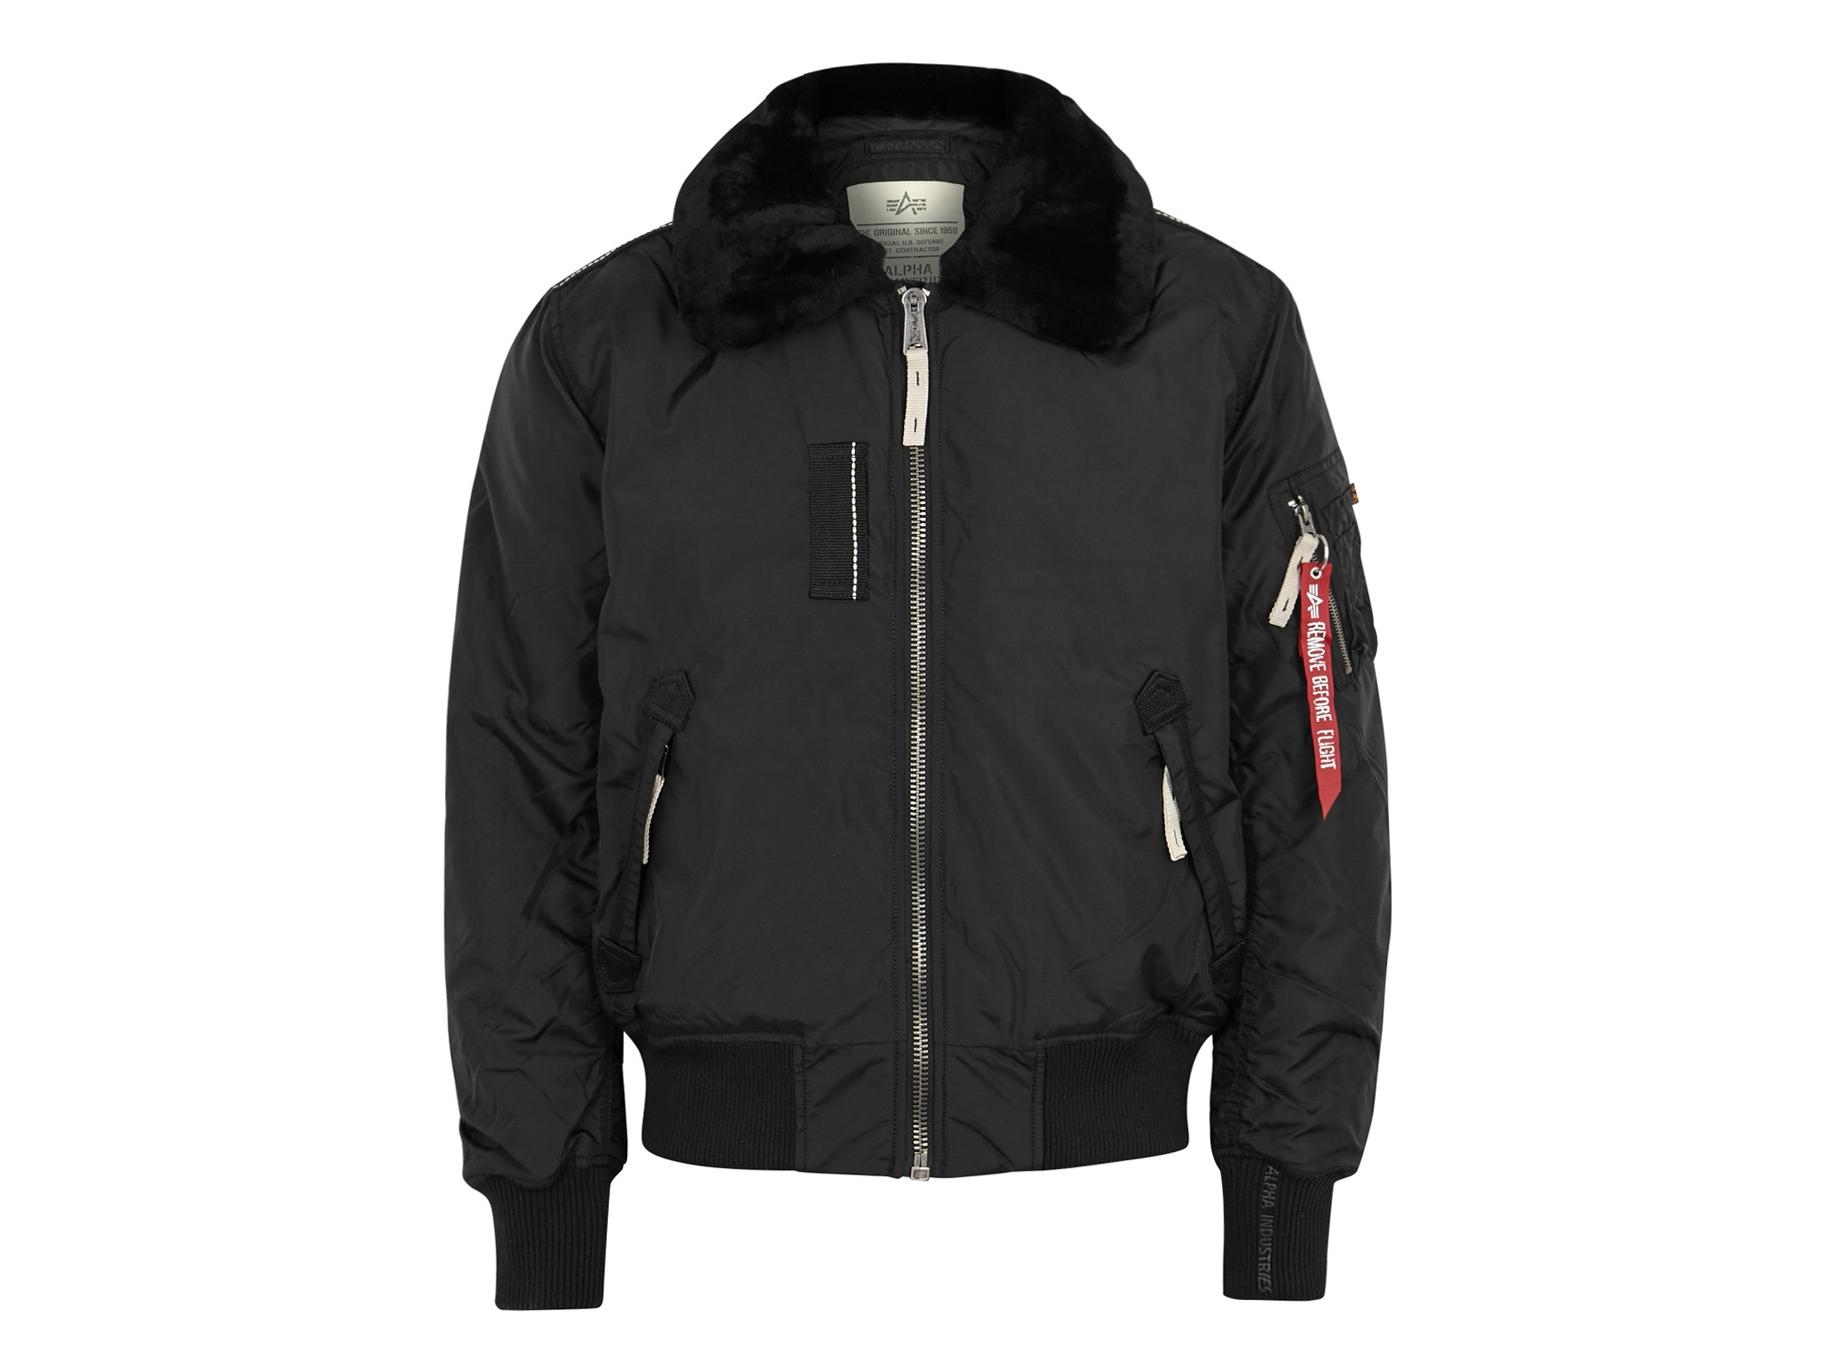 1476cc53a Injector III shell bomber jacket